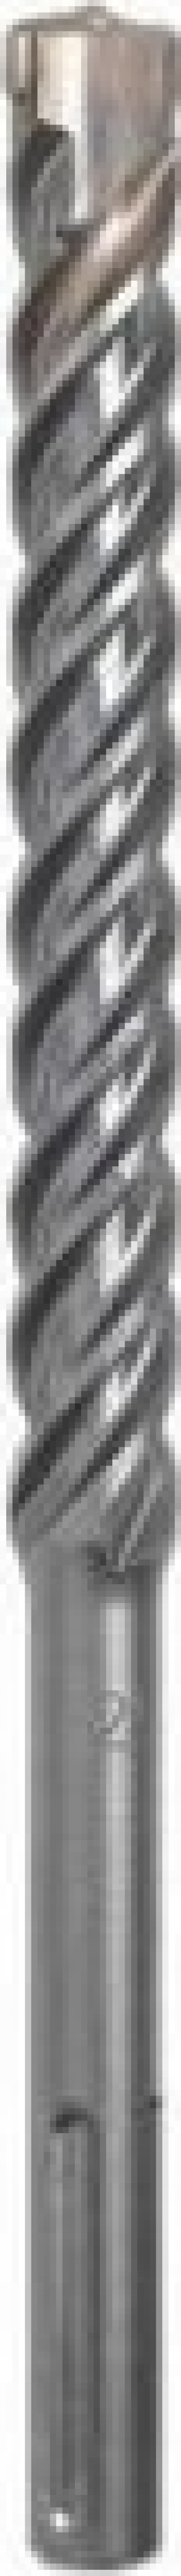 Burghiu SDS-max EXTREME 14 x 200 x 340 mm Dewalt Accesorii masini de gaurit